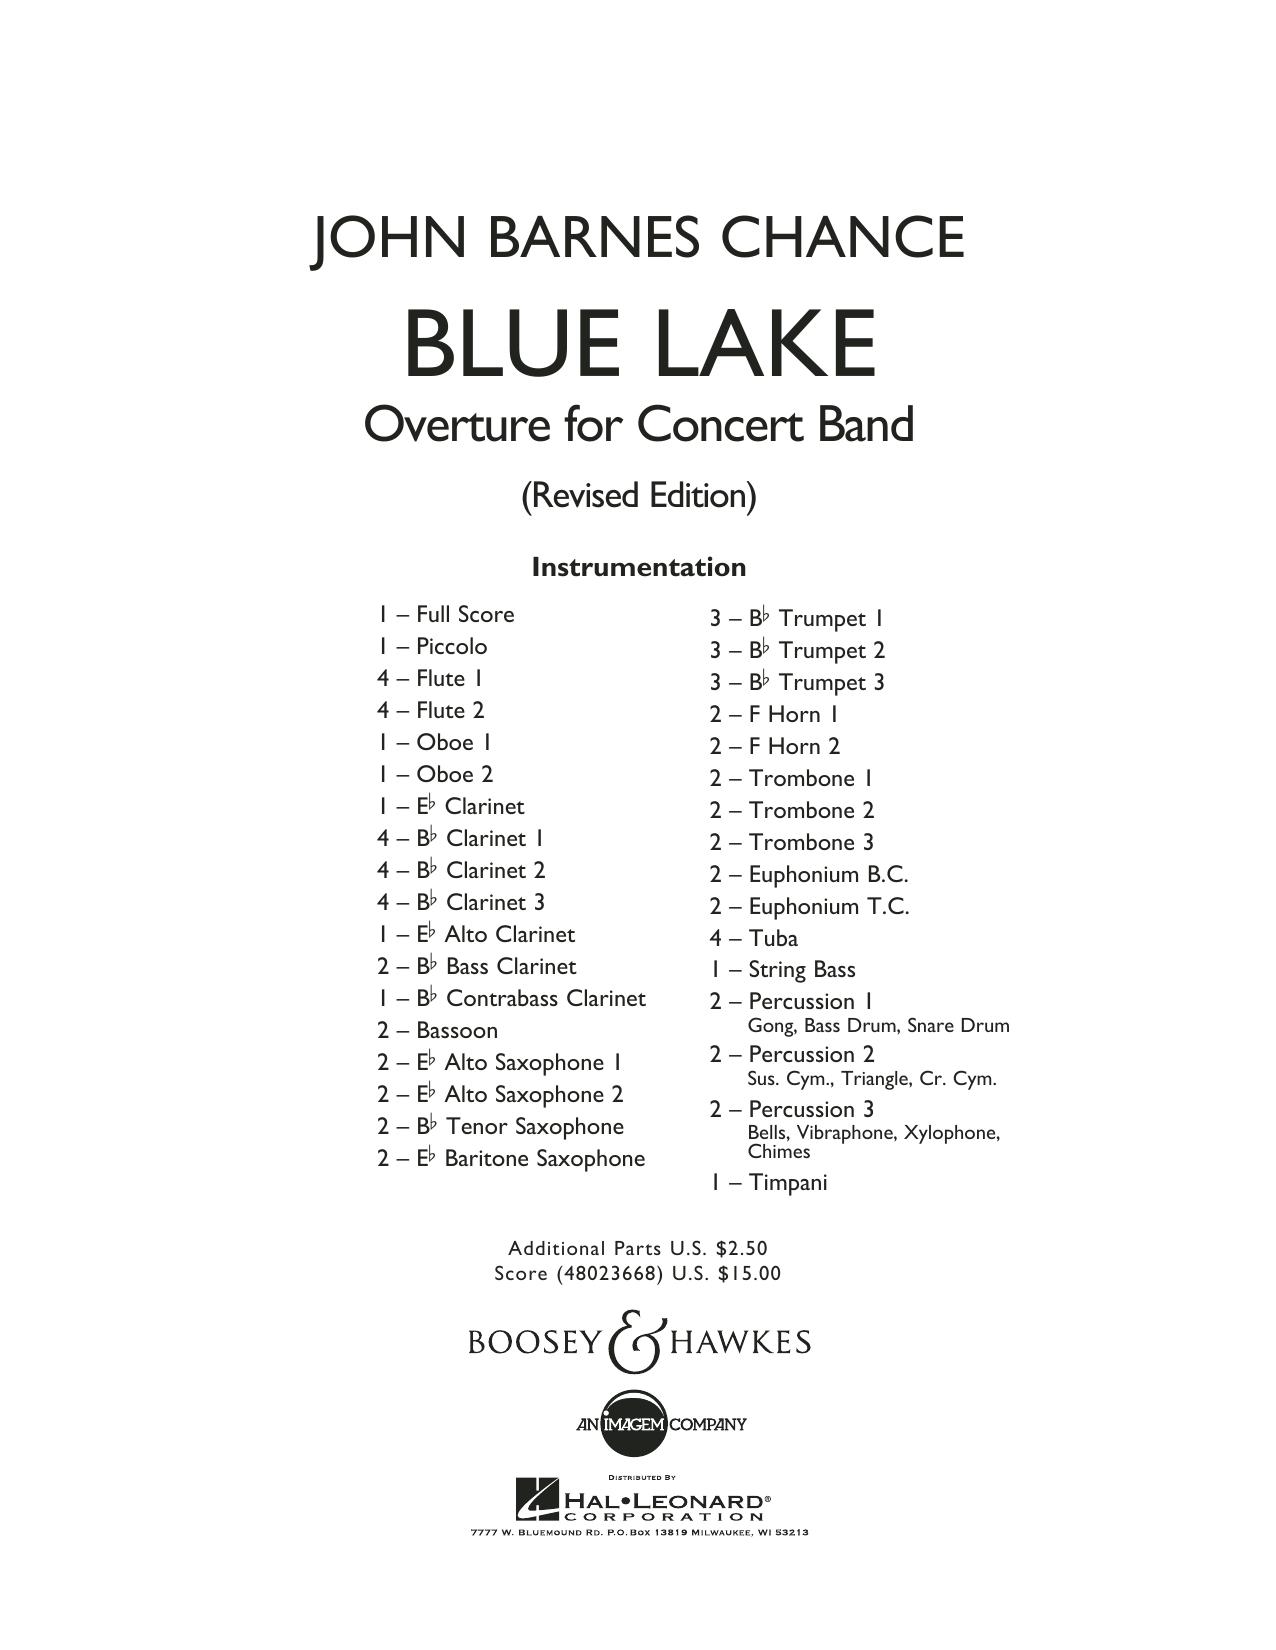 Blue Lake (Overture for Concert Band) - Full Score (Concert Band)